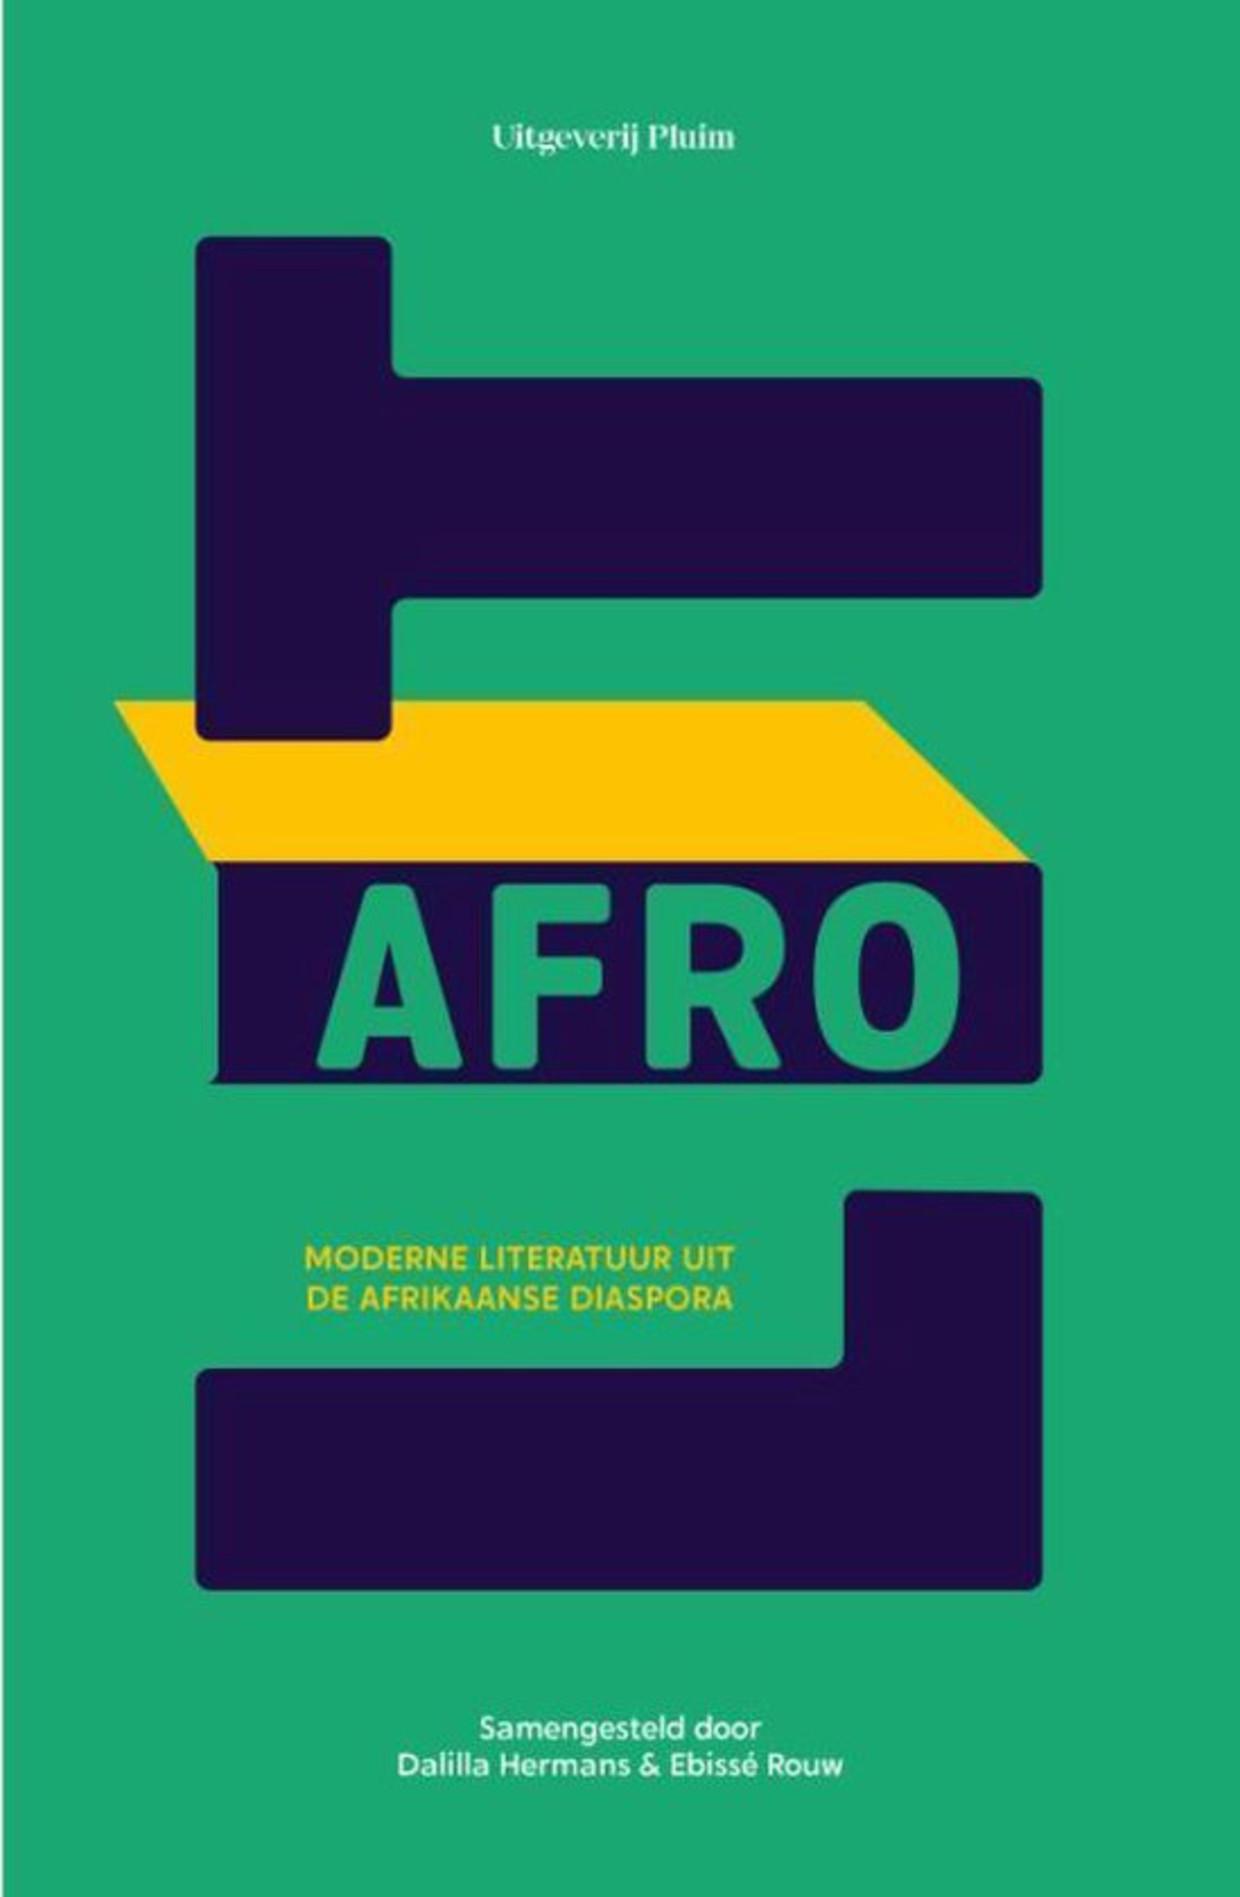 Afro Lit - Moderne literatuur uit de Afrikaanse diaspora (Dalilla Hermans) Beeld Uitgeverij Pluim